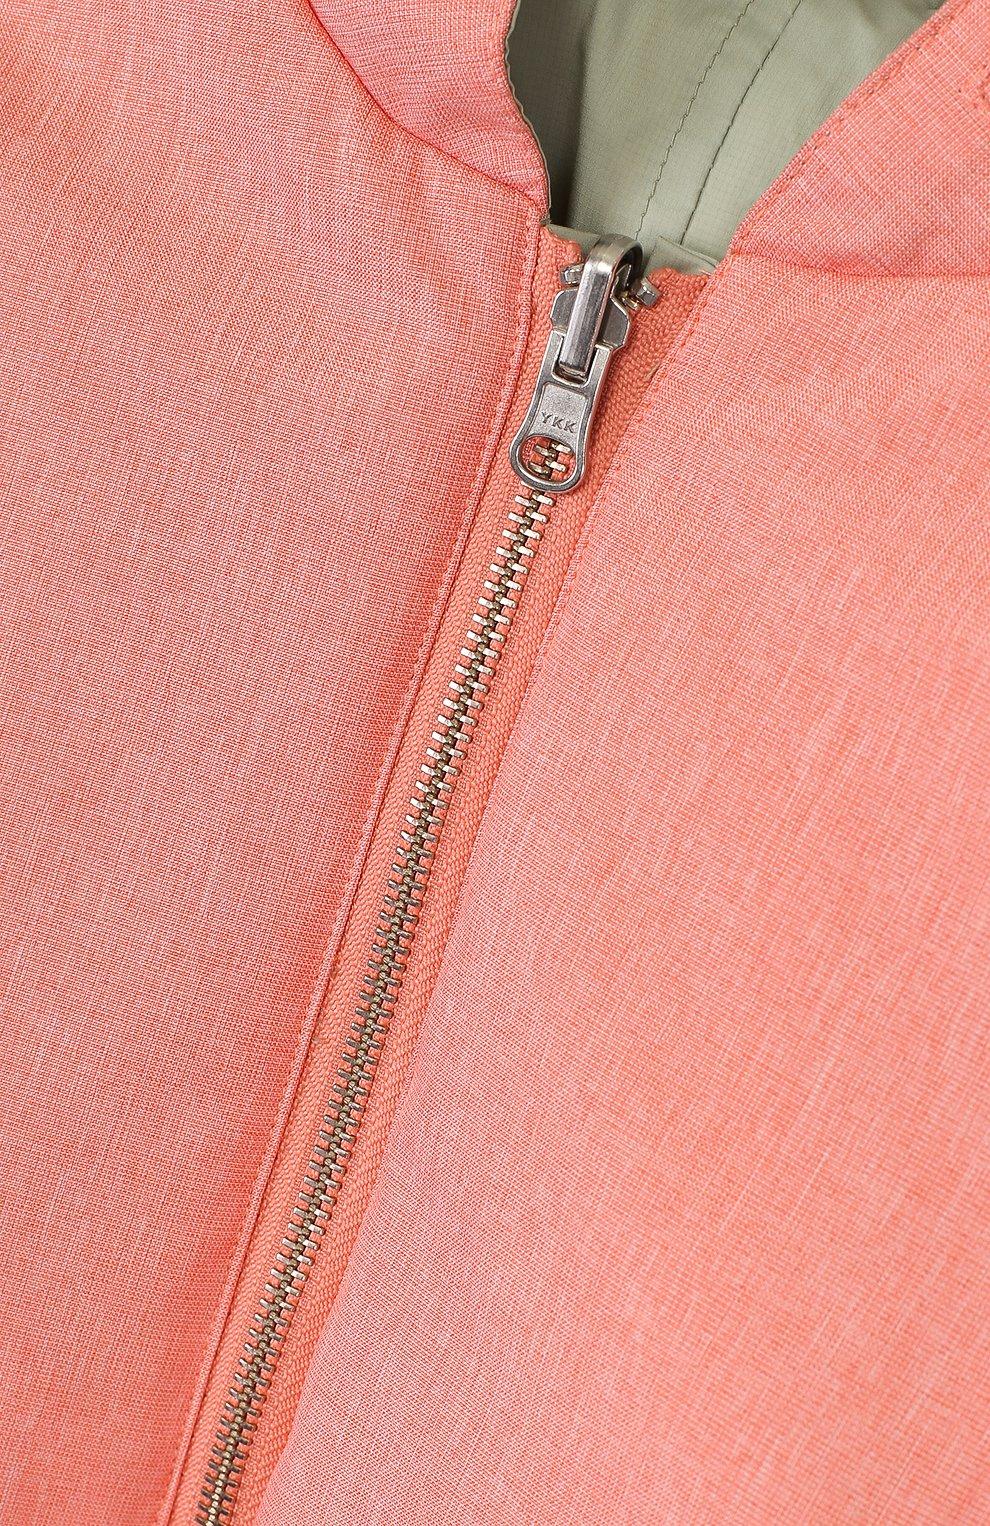 Куртка на молнии с капюшоном   Фото №3